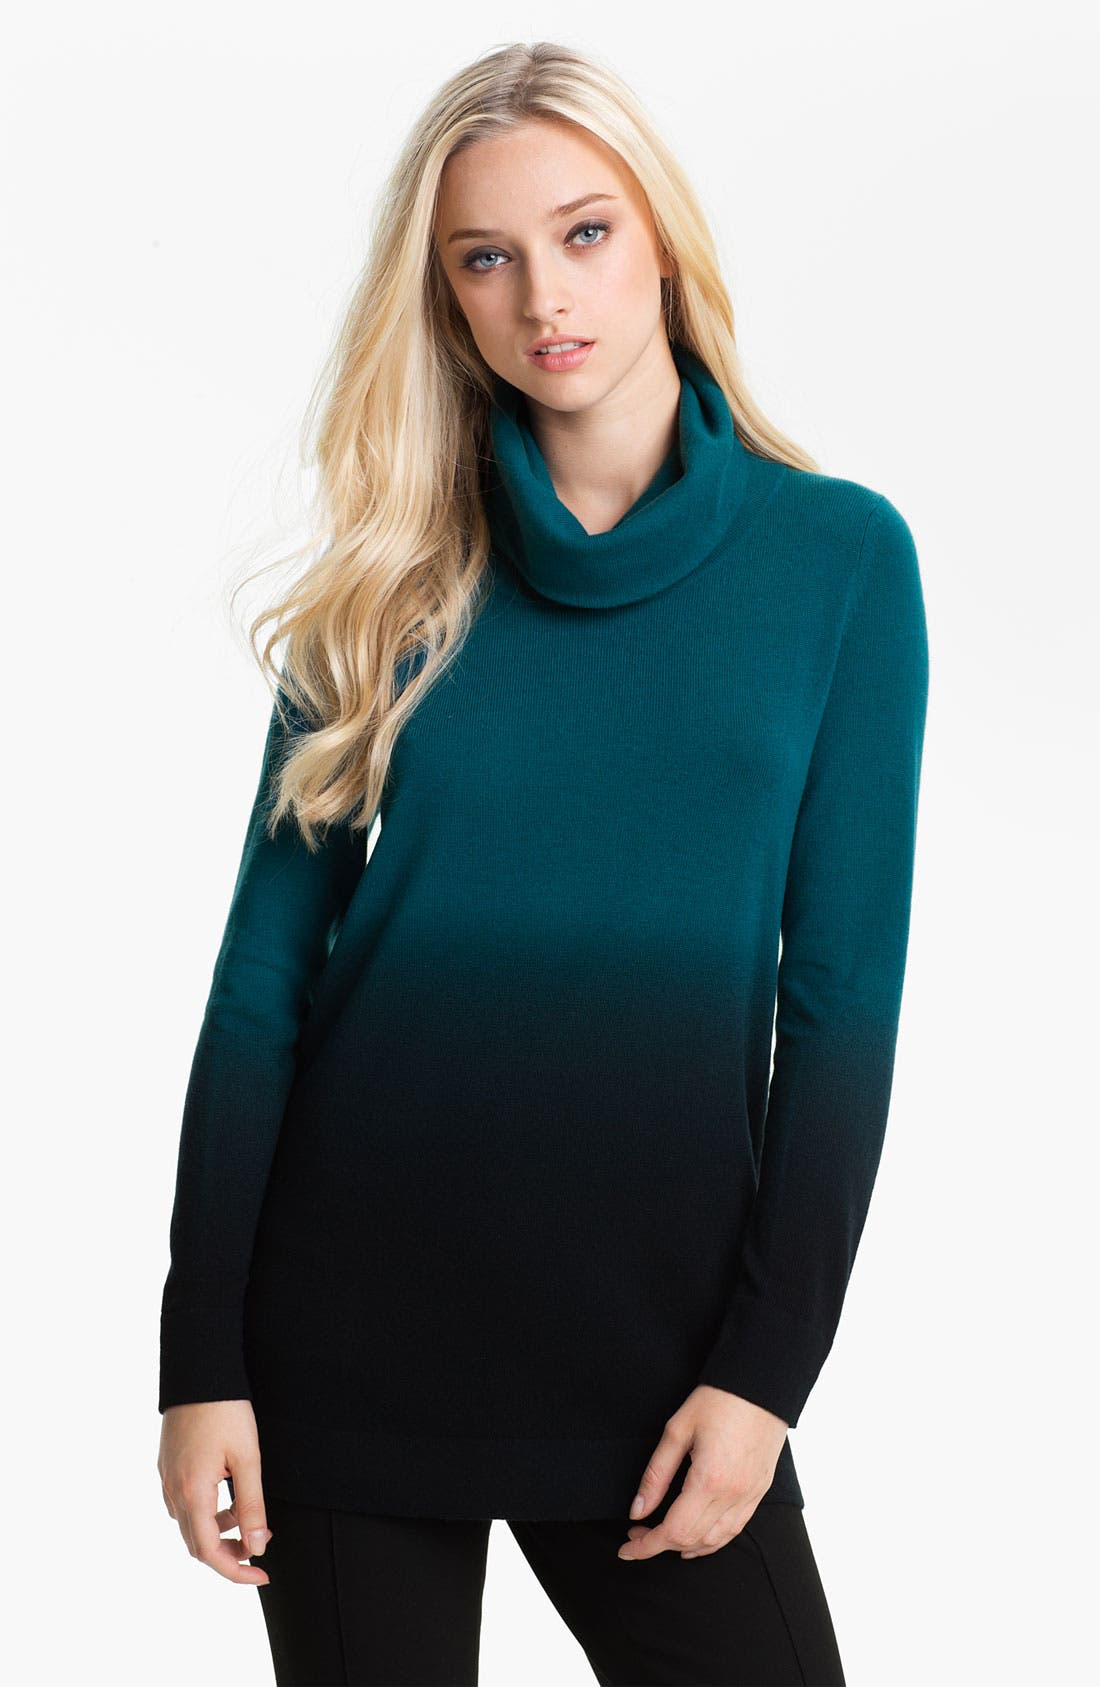 Main Image - Nordstrom Collection Ombré Cashmere Turtleneck Sweater